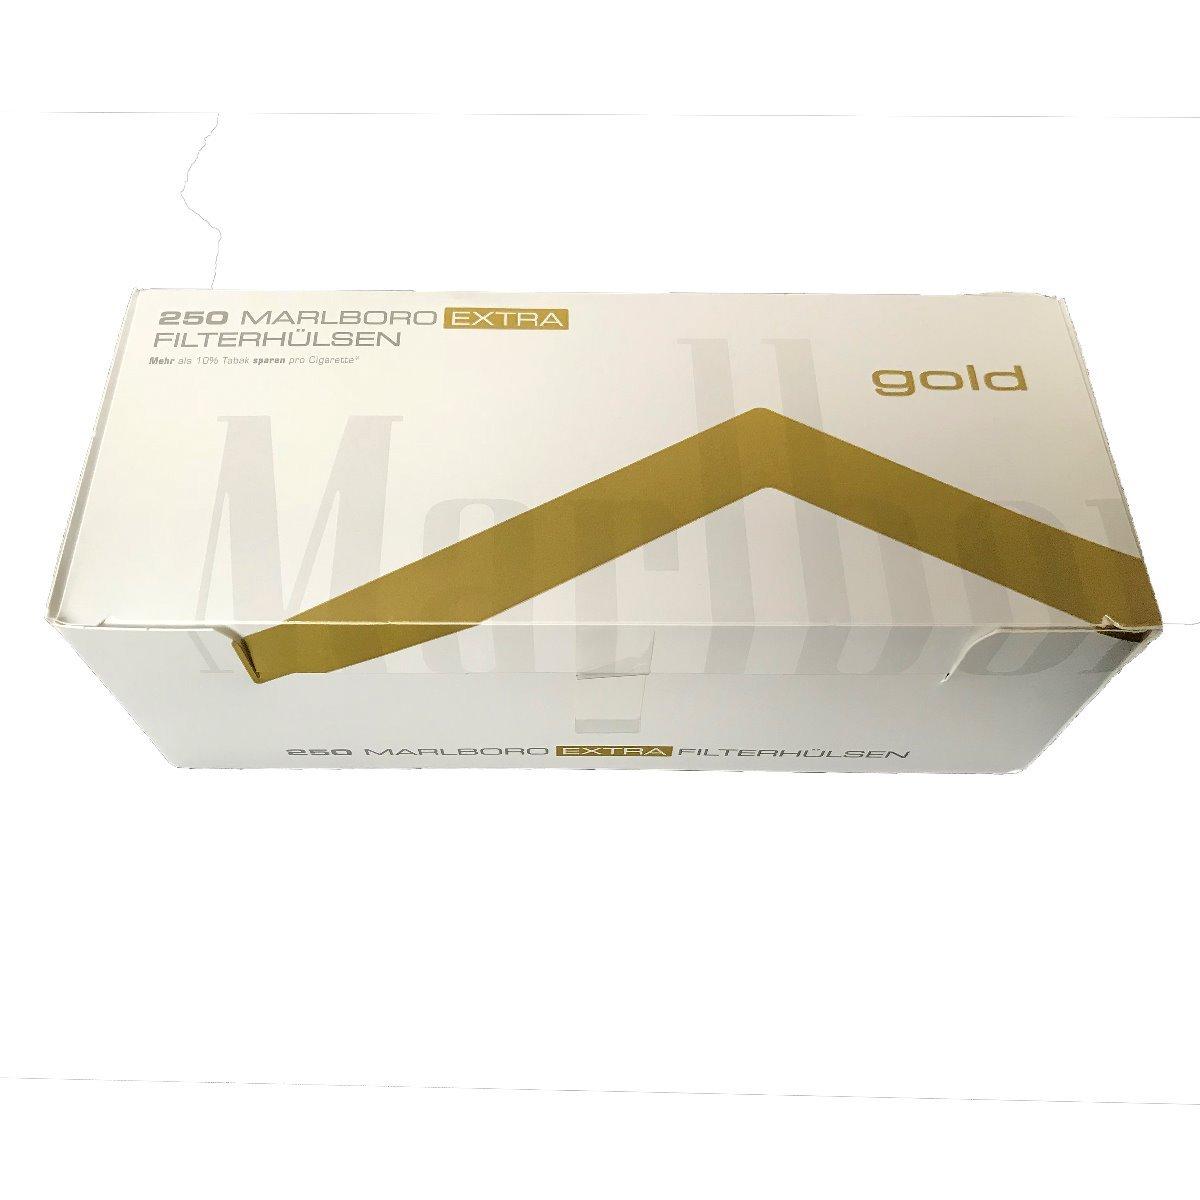 Marlboro Gold Extra Filterhülsen